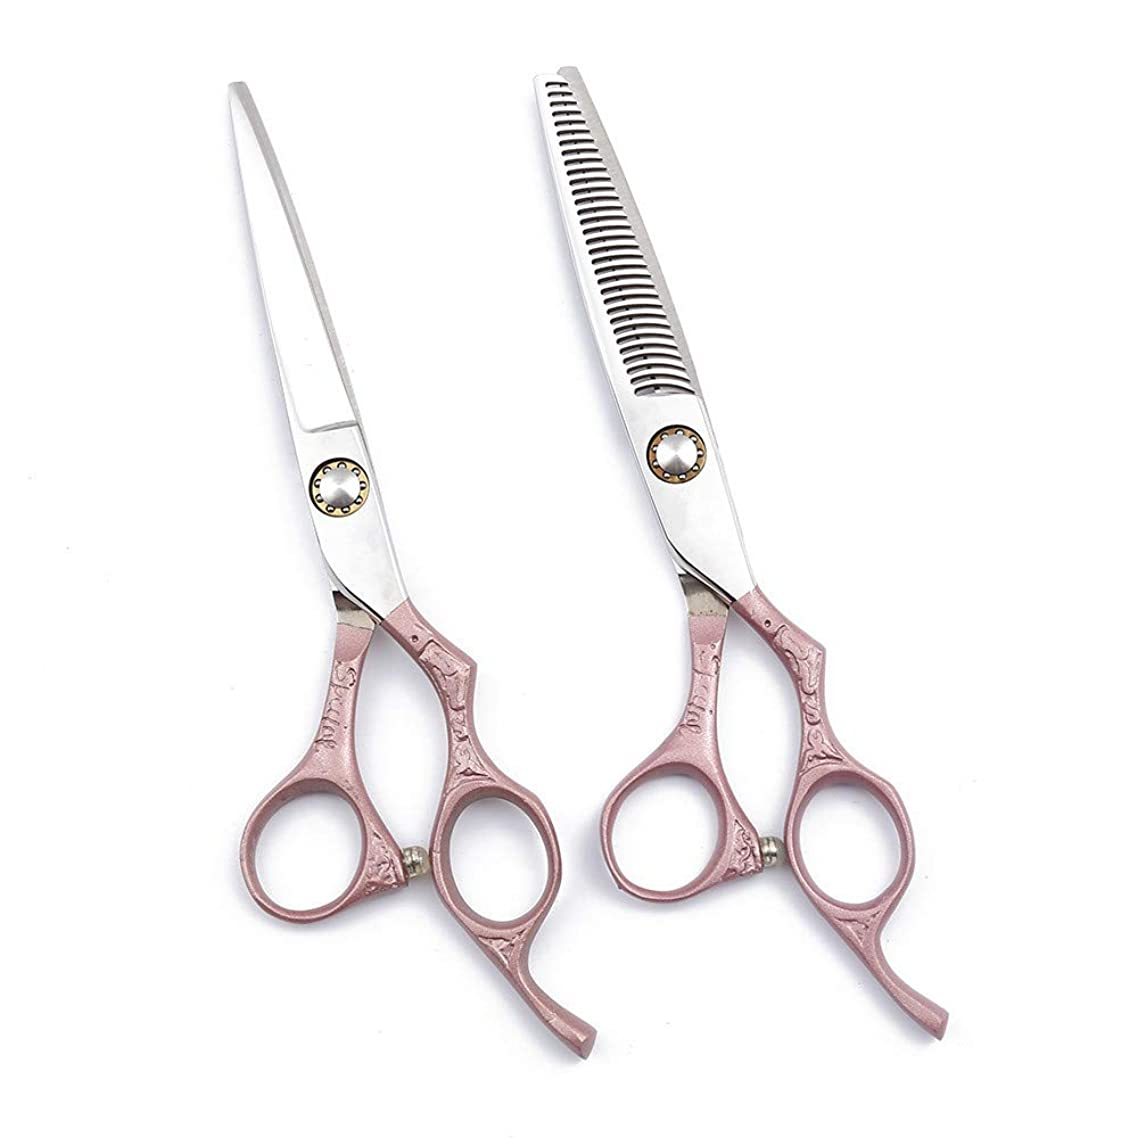 TAOUN Hairdressing Scissor Set Pink 6.0 Inch Personality Hairdressing Cutting Scissors/Thinning Shears for Salon Barber or Home